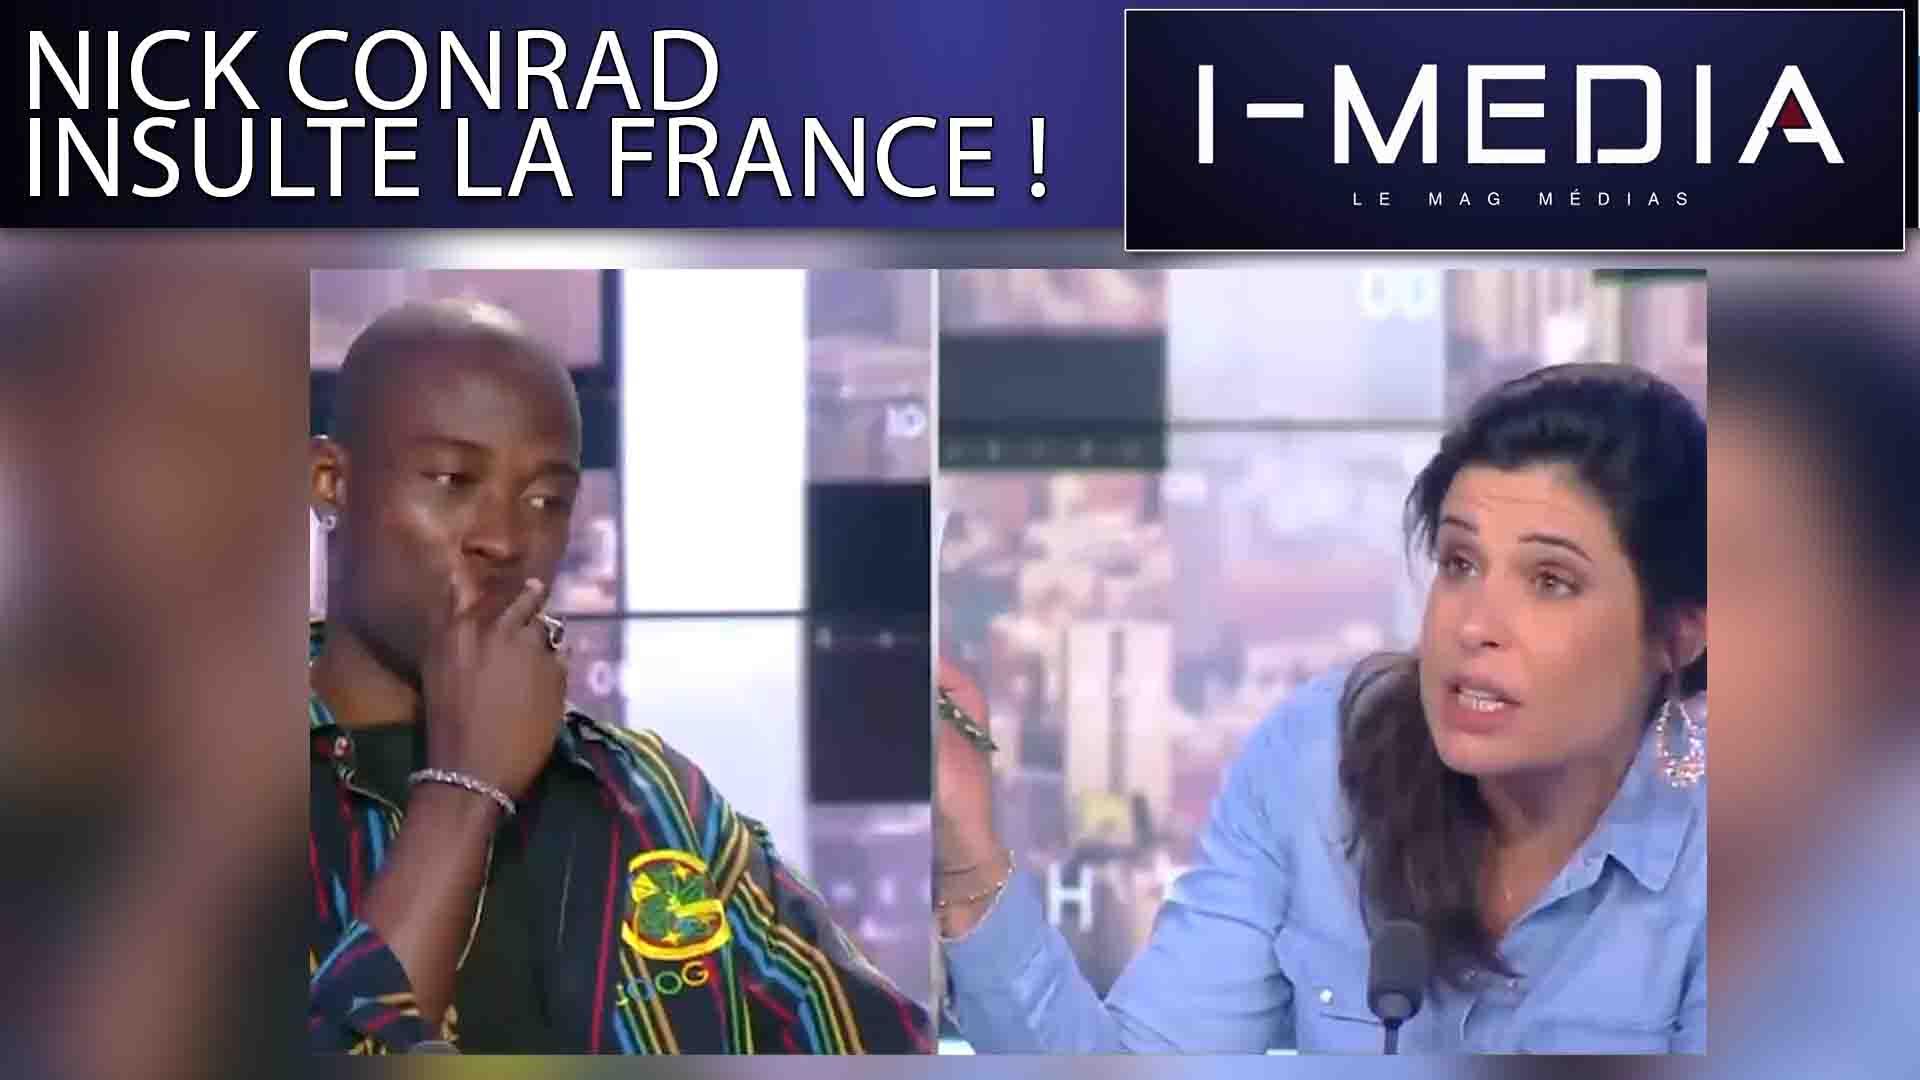 I-Média n°251 – Nick Conrad insulte la France !